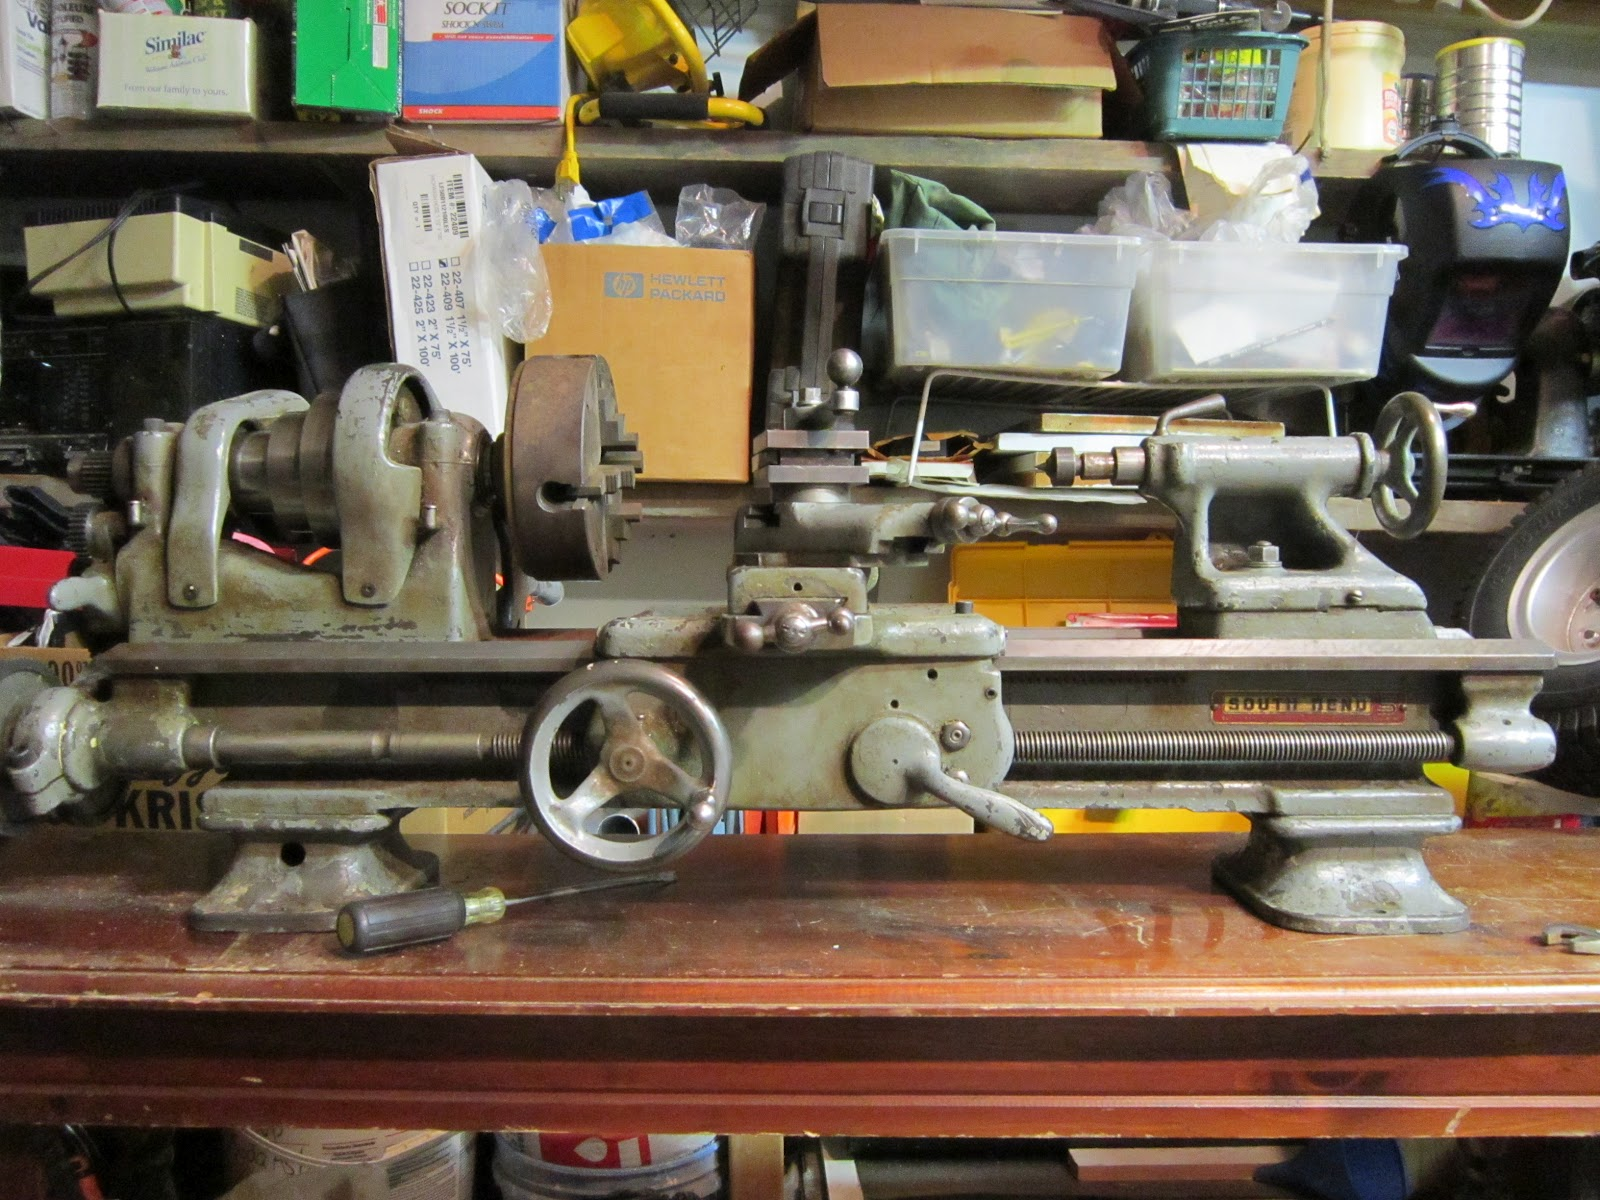 Maniac Mechanics: My new old South Bend Lathe